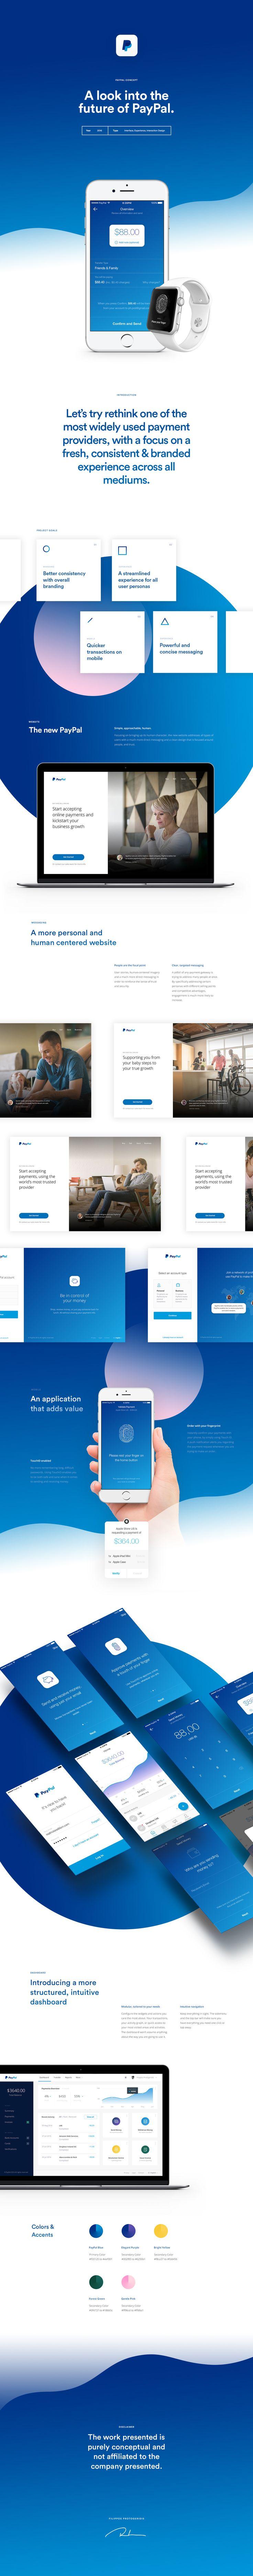 Concepto de diseño de interfaz de usuario de PayPal